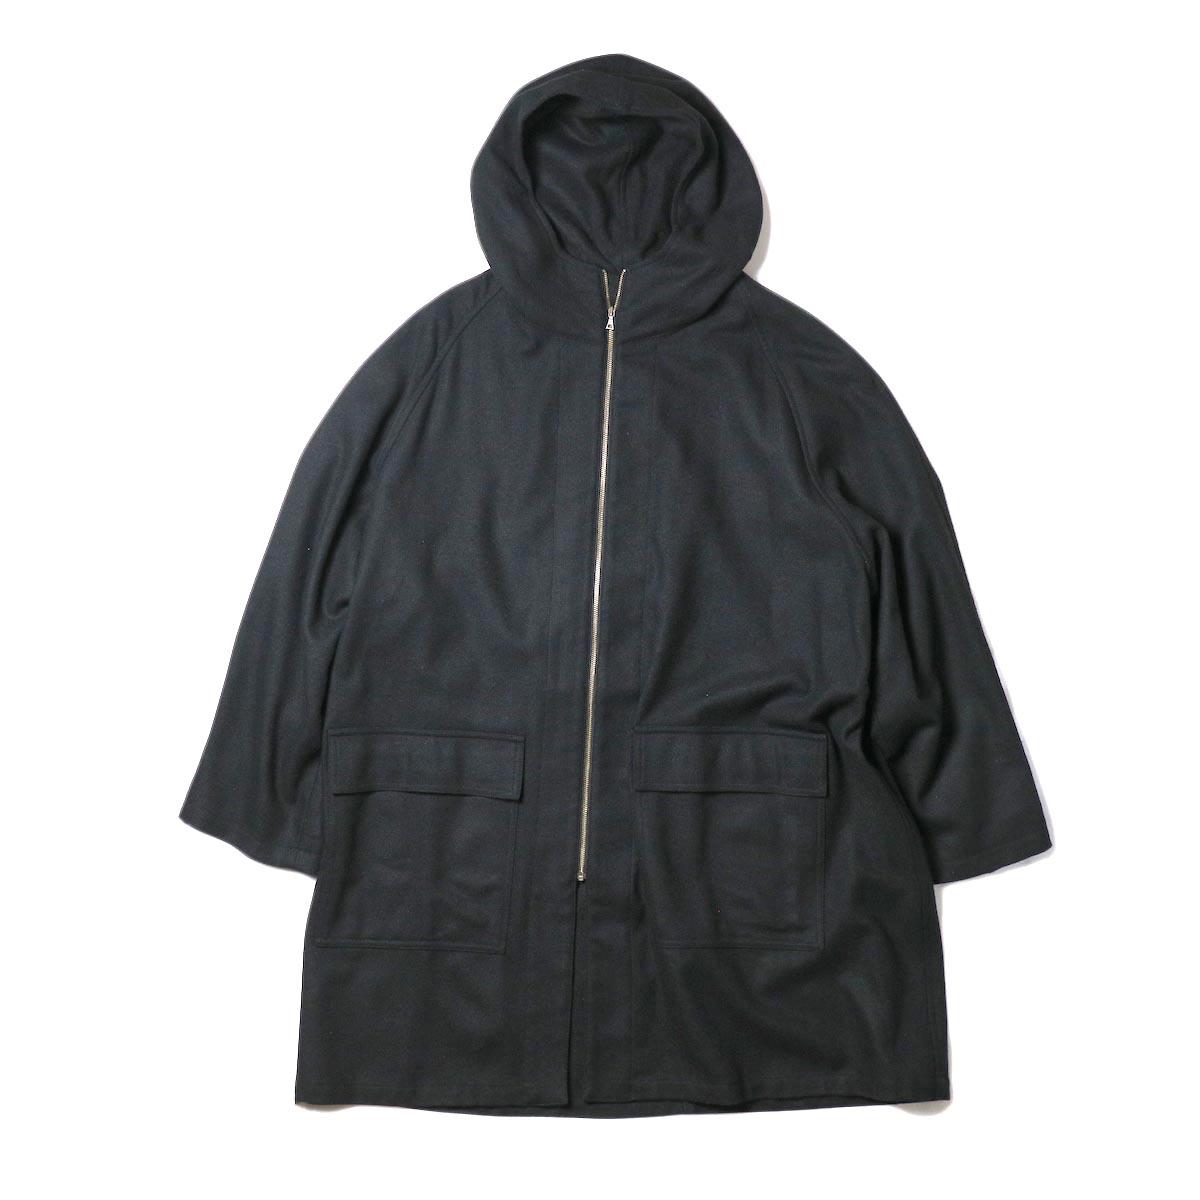 HTS / HOODED COAT (Black)